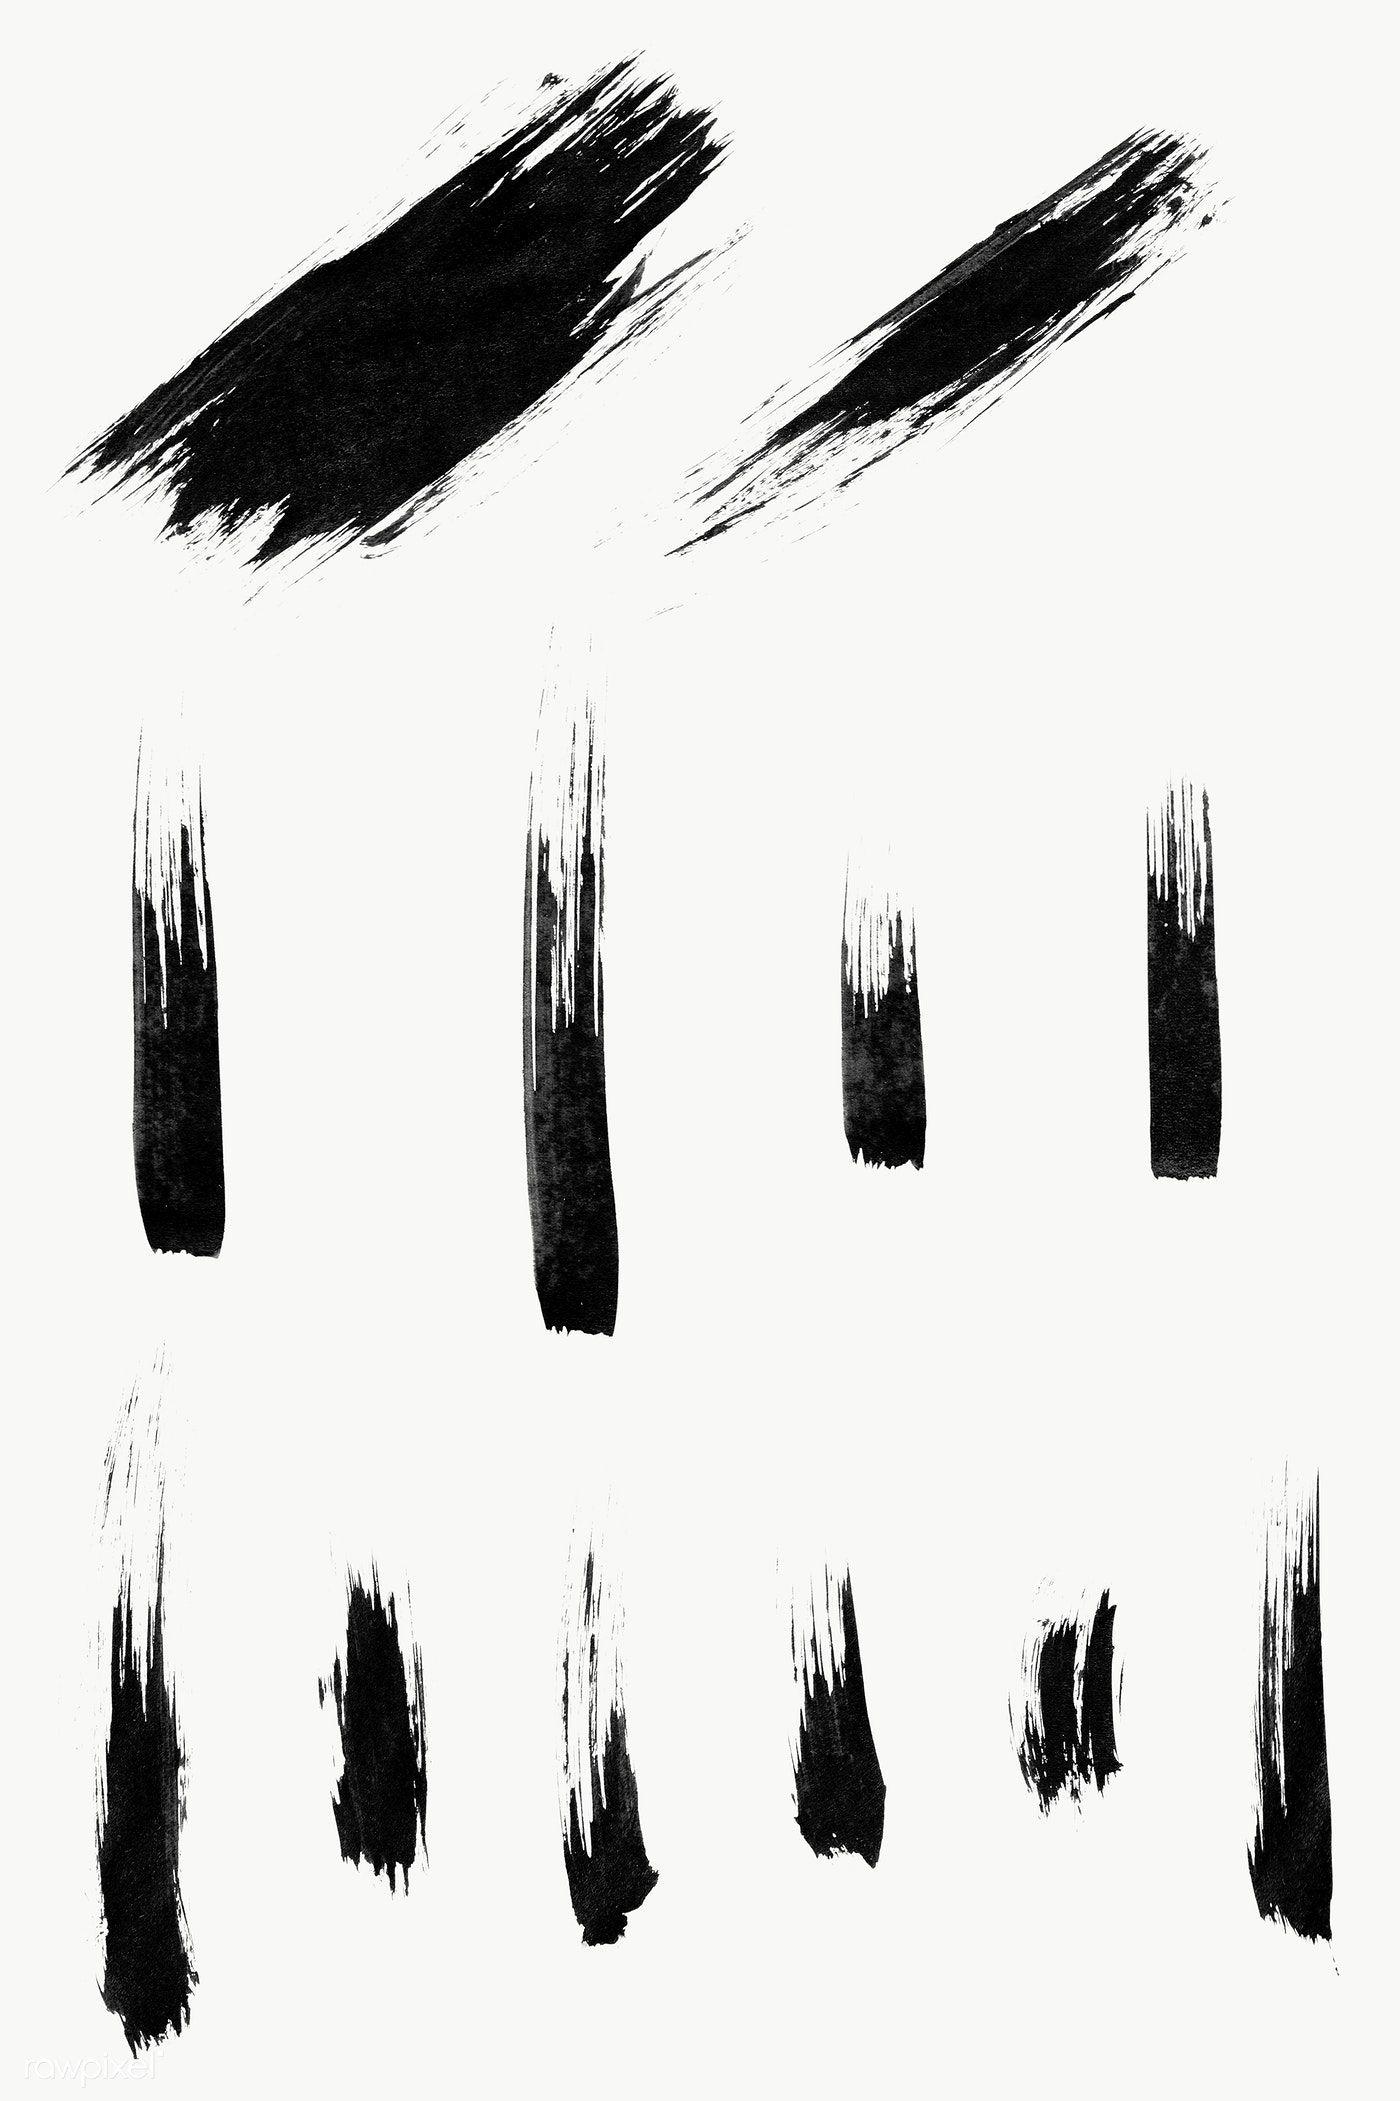 Abstract Black Brush Stroke Set Transparent Png Free Image By Rawpixel Com Brush Tattoo Brush Strokes Brush Stroke Tattoo